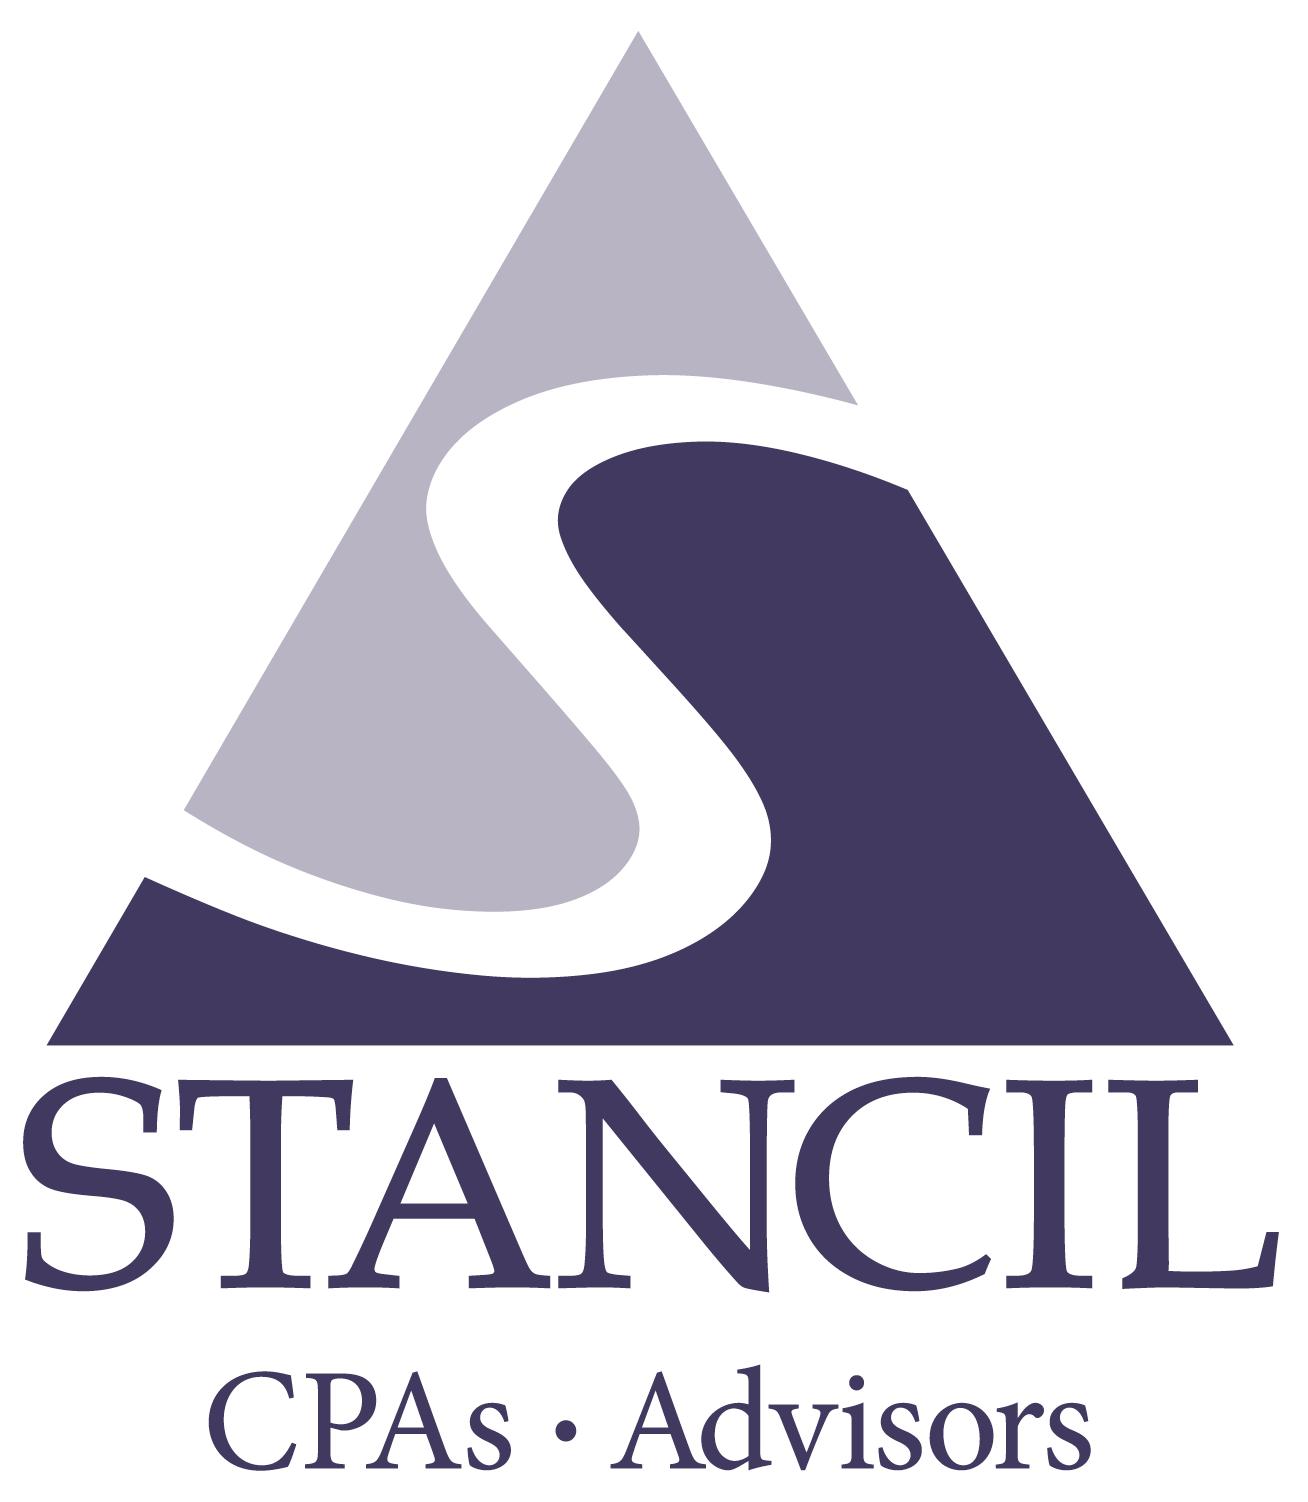 Stancil CPAs logo